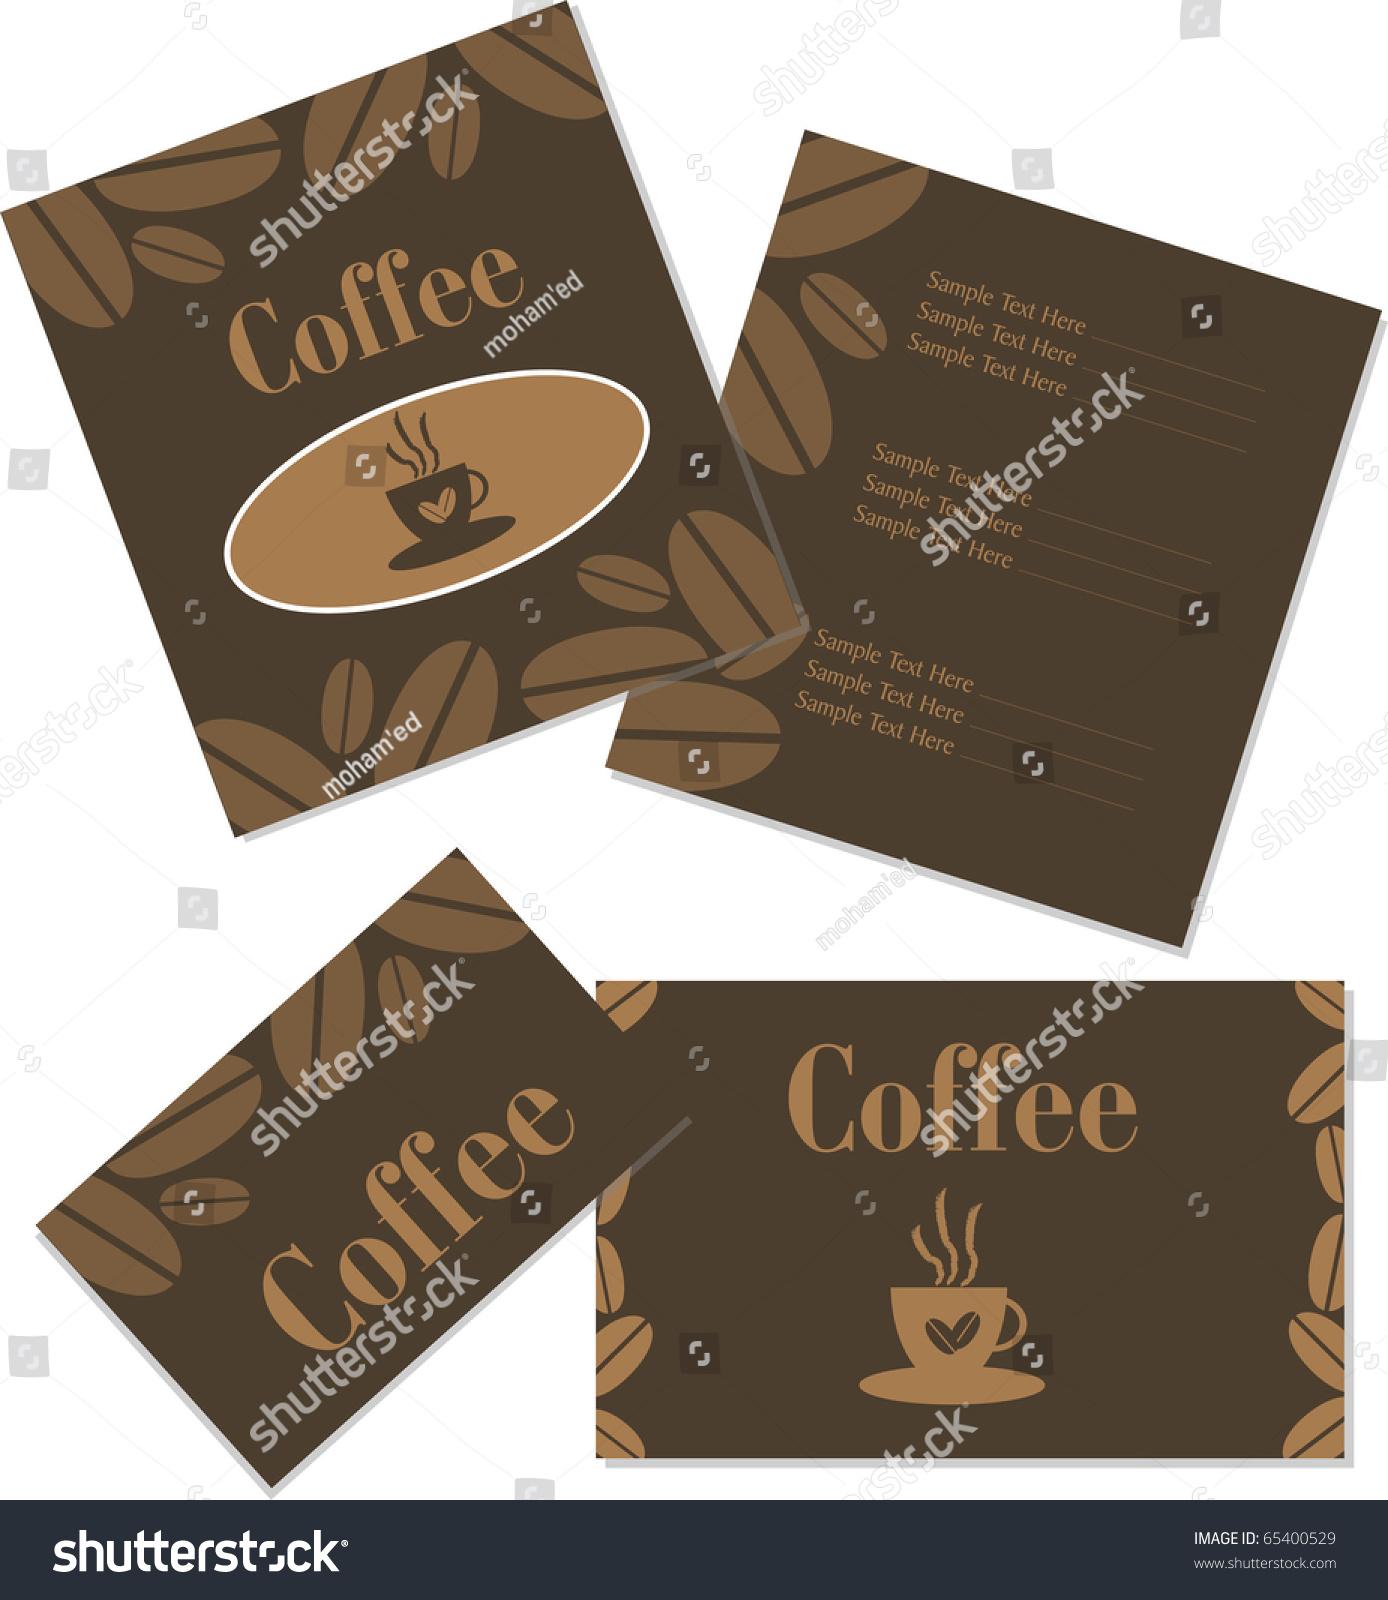 Menu Business Card Design Coffee Shop Stock Vector 65400529 ...